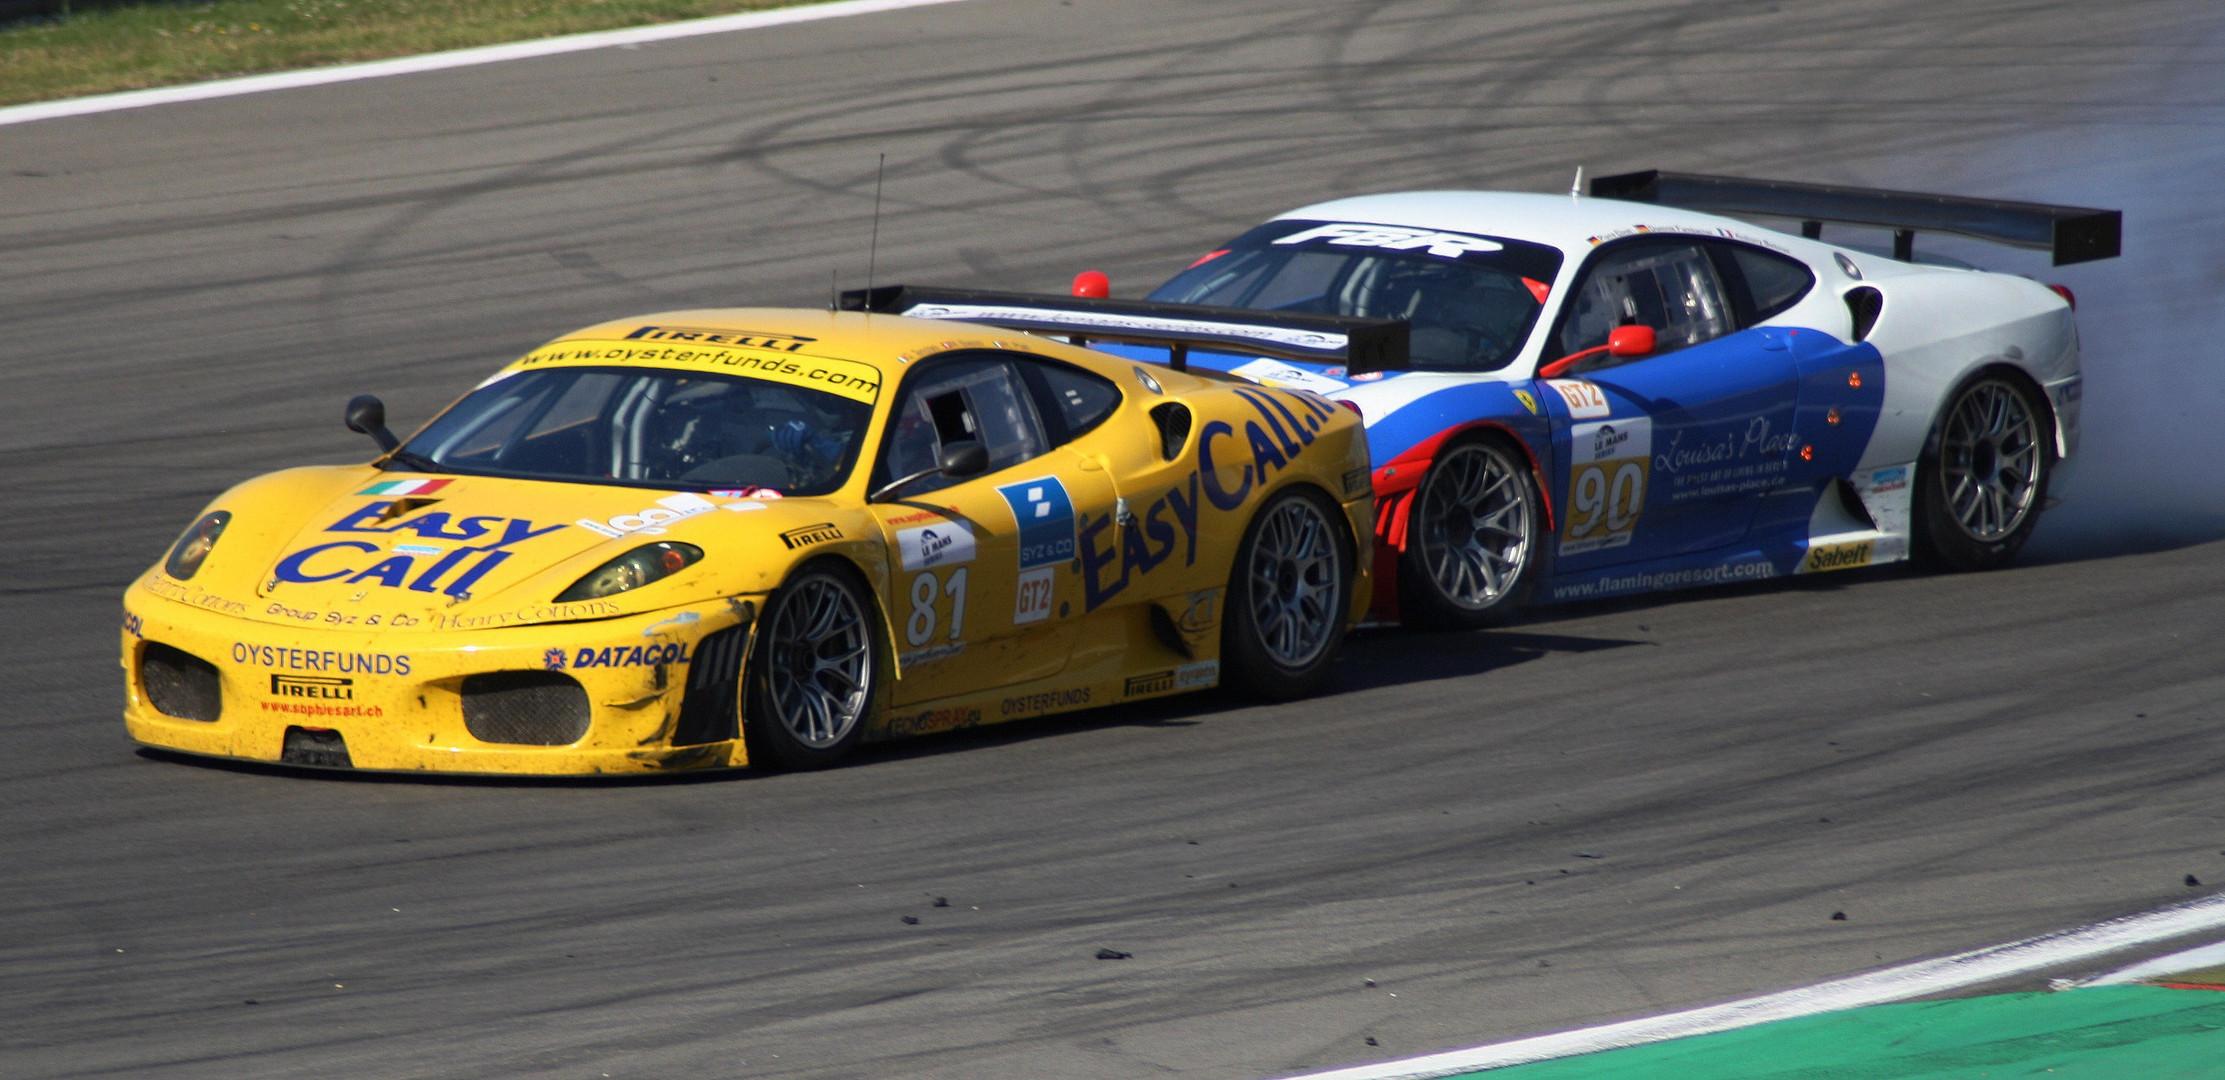 Ferrari allesisterlaubt Wochen 7